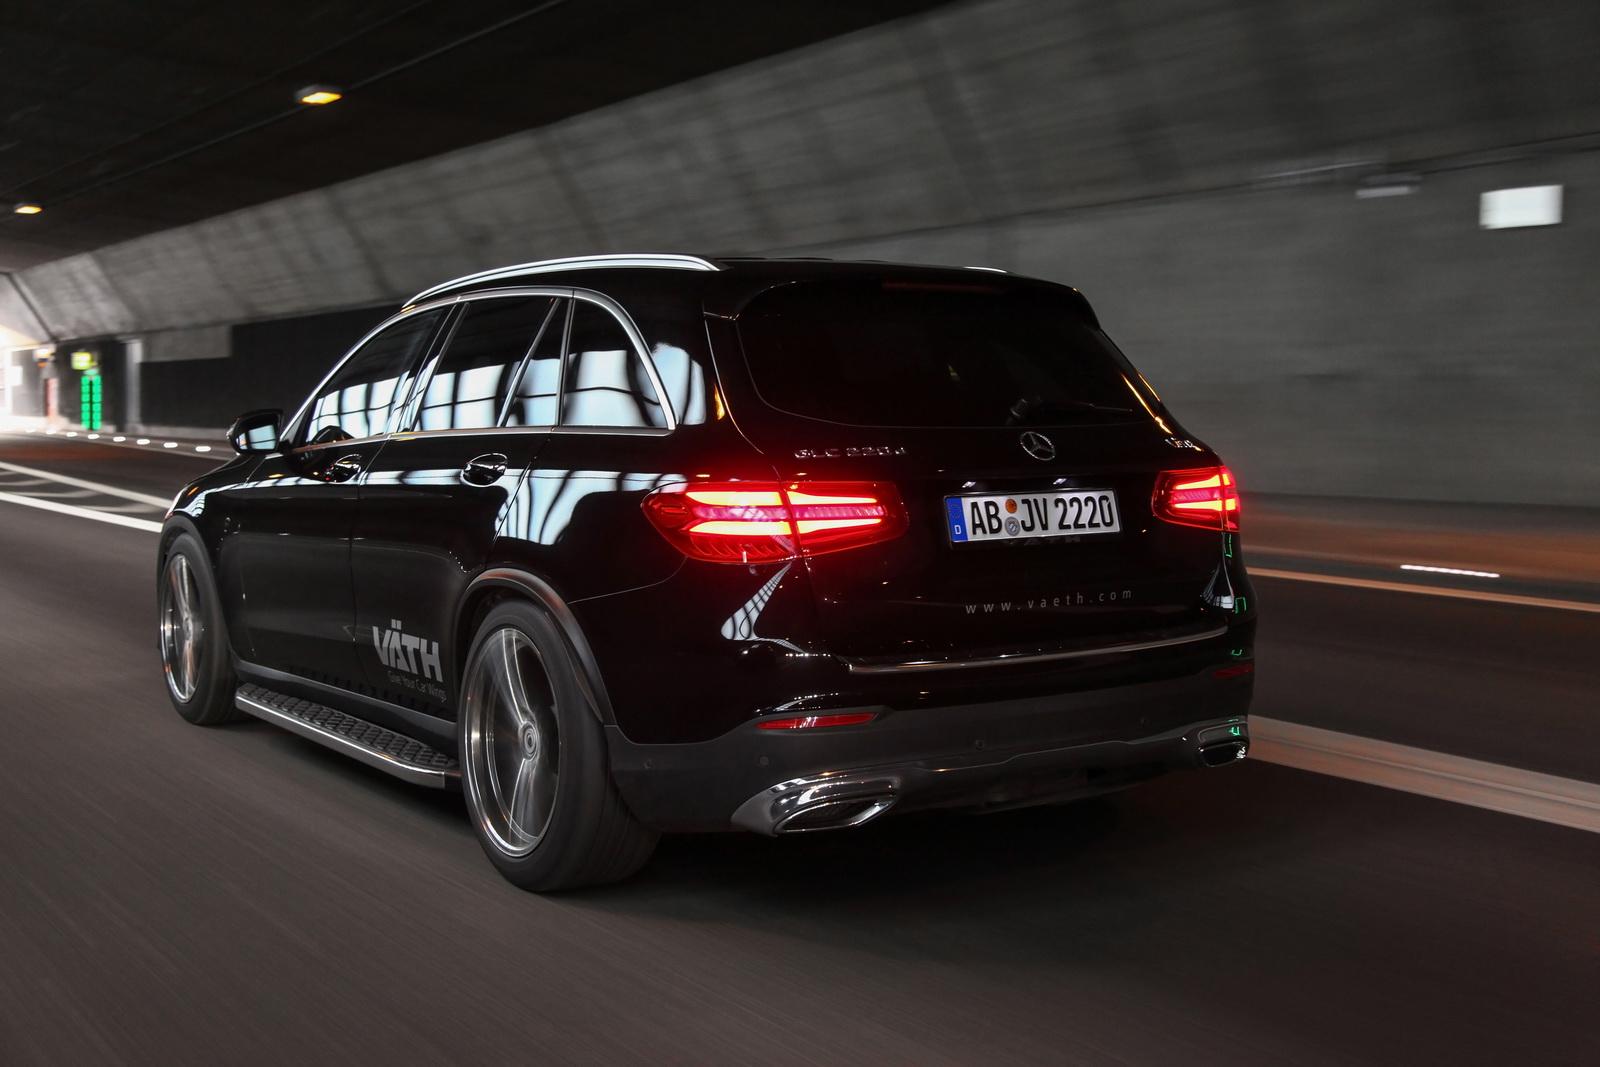 Mercedes_GLC220d_by_Vath_15